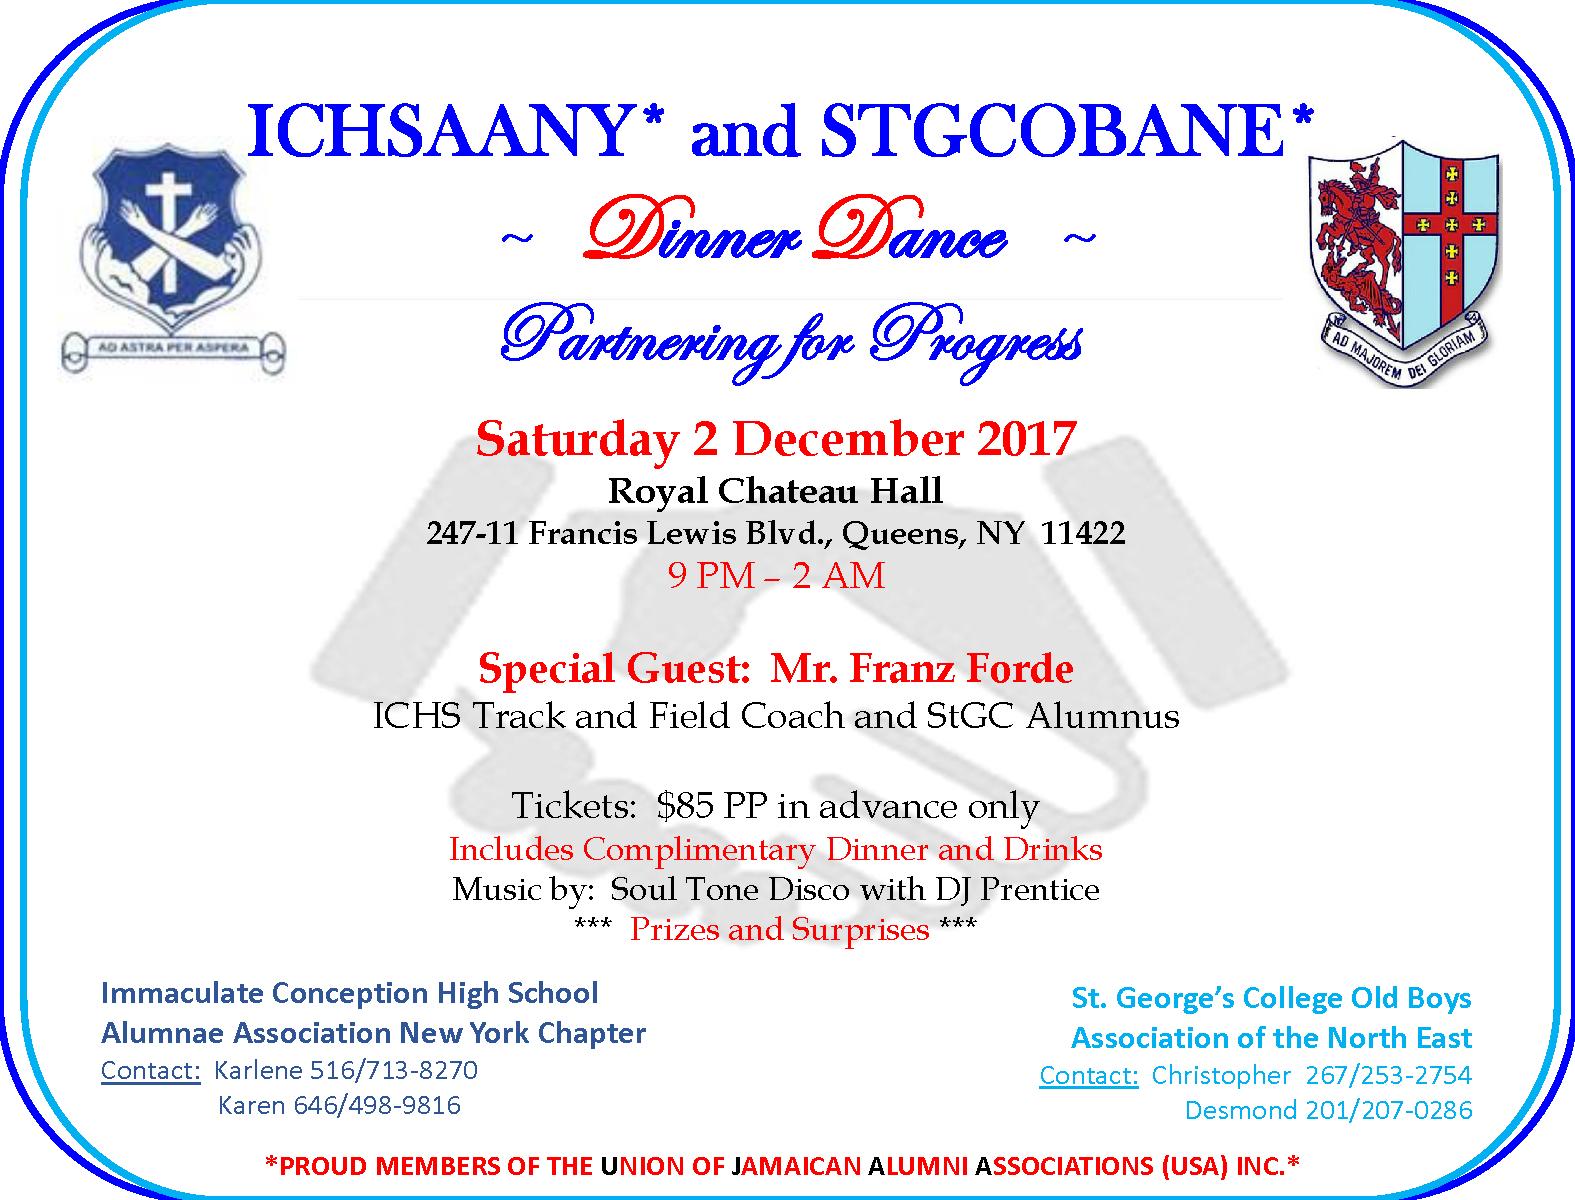 ICHSAANY & STGCOBANE Dinner Dance 2017 – ICHS Alumnae